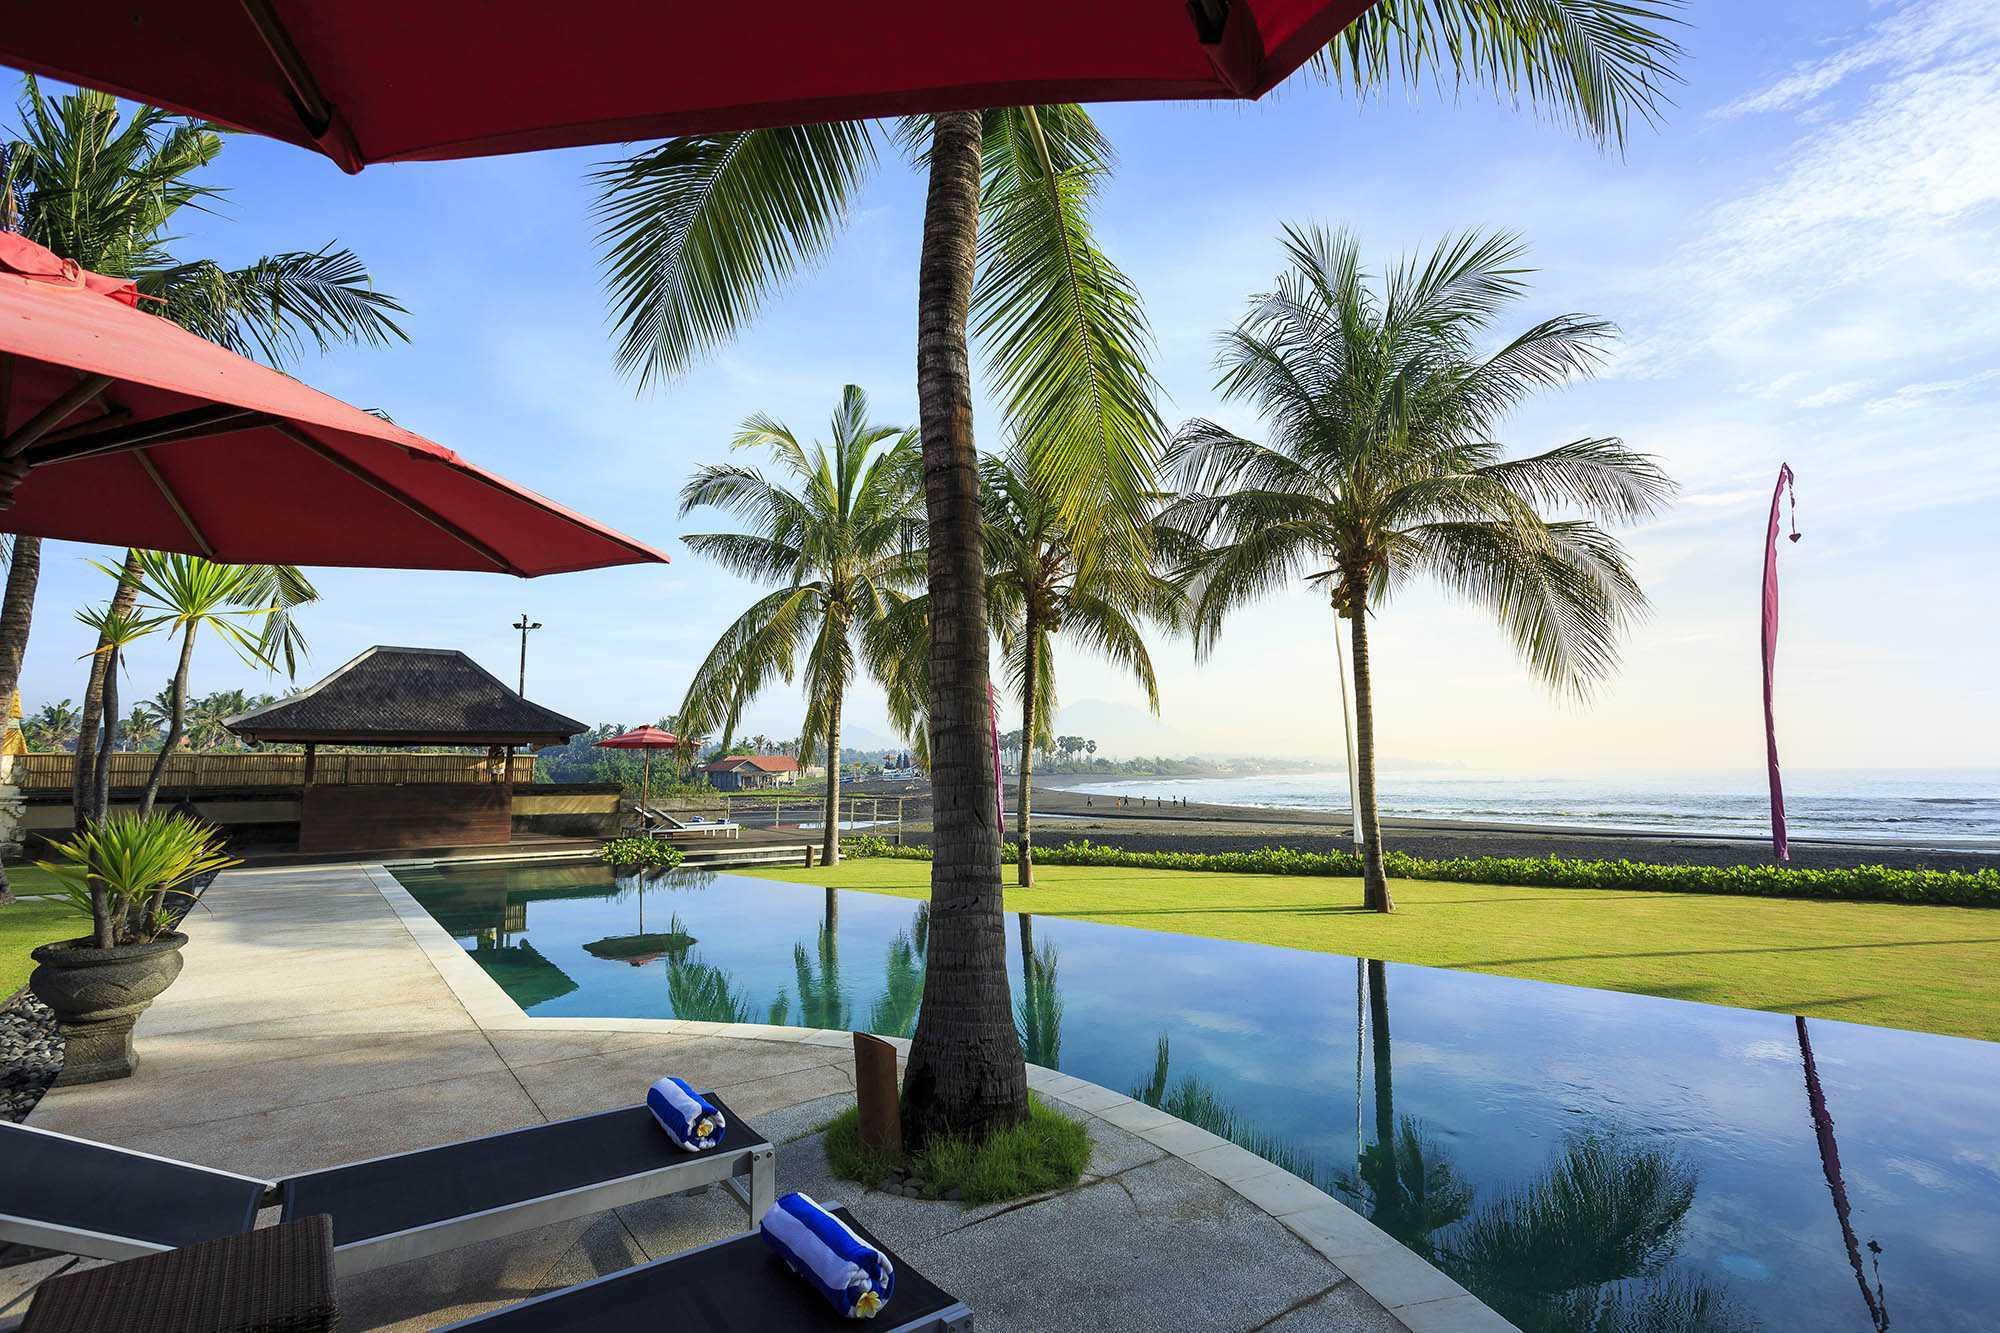 Agung Budi Raharsa | Architecture & Engineering Pushpapuri Villa - Bali Bali, Indonesia Bali, Indonesia Agung-Budi-Raharsa-Pushpapuri-Villa   88356